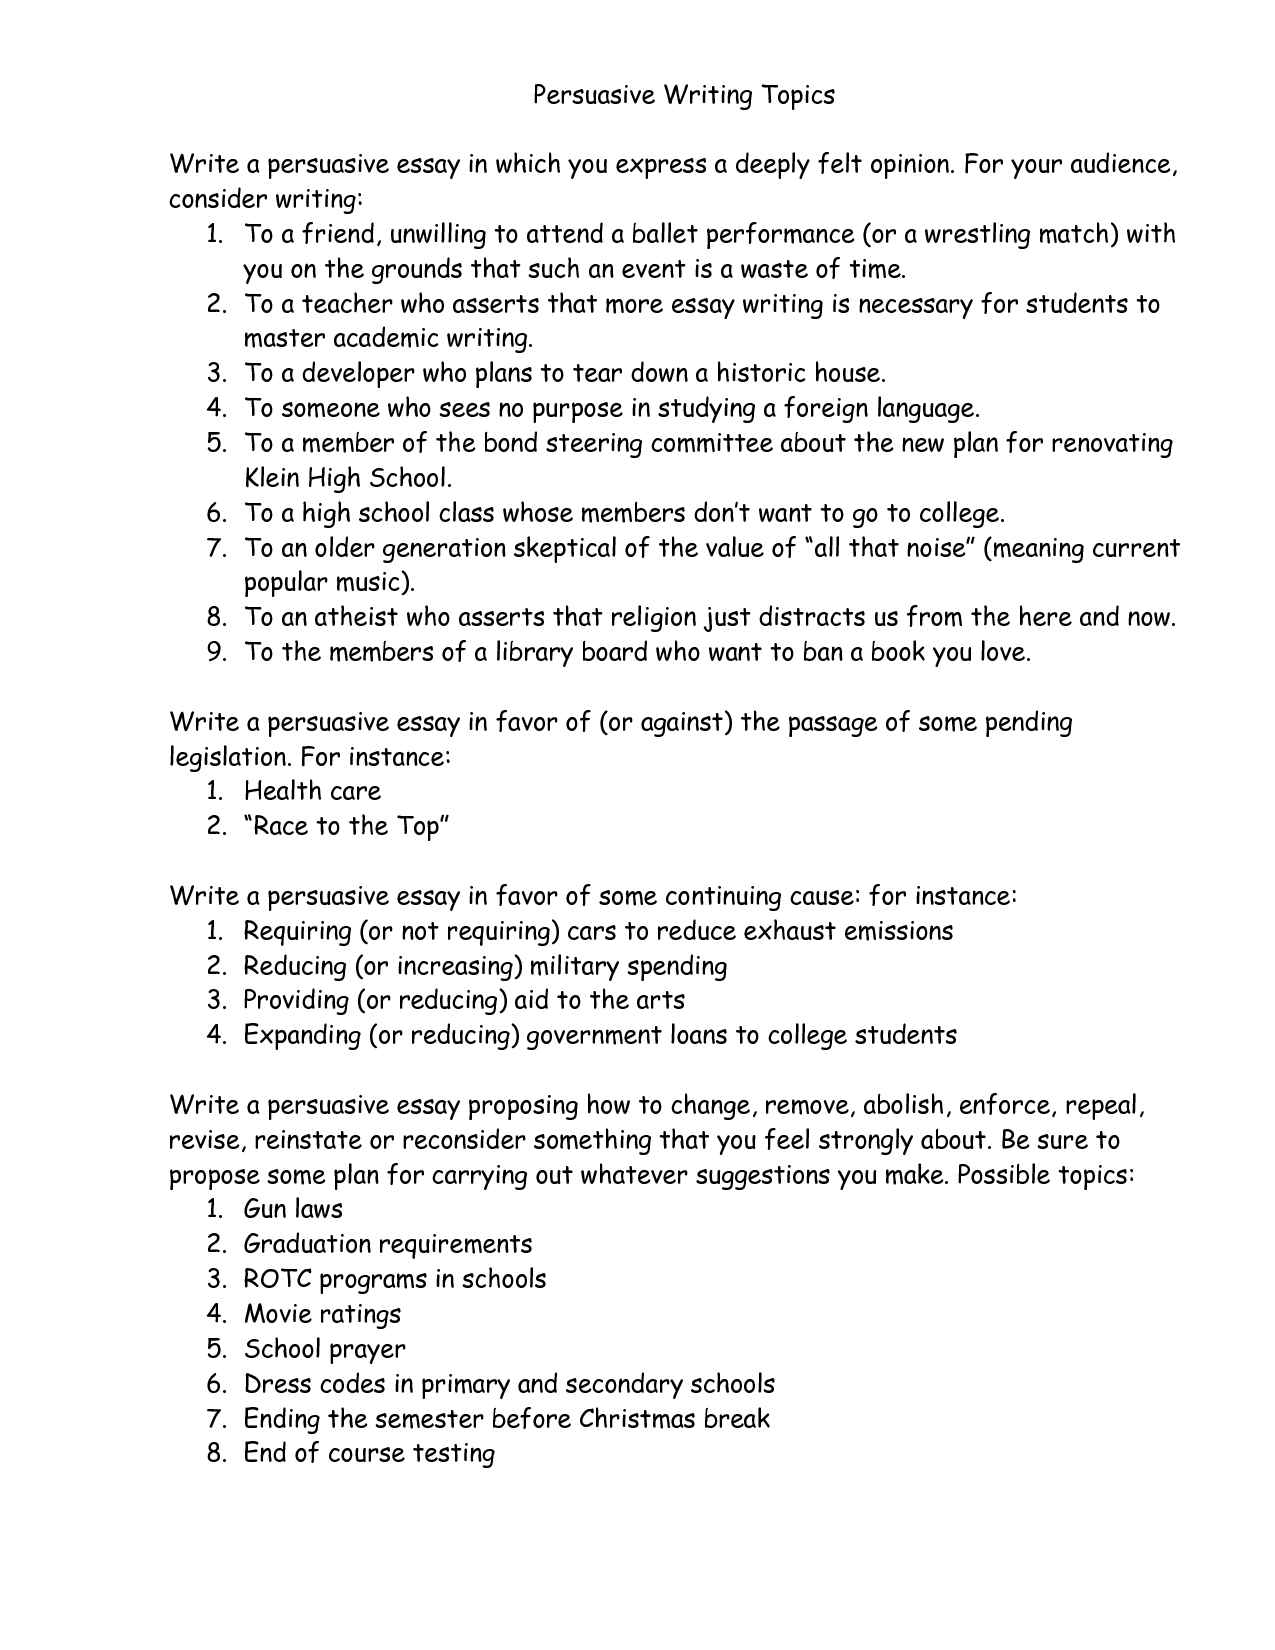 008 Essay Example Mfrv3azzsf Best Persuasive Beautiful Topics Uk Argumentative For College Full